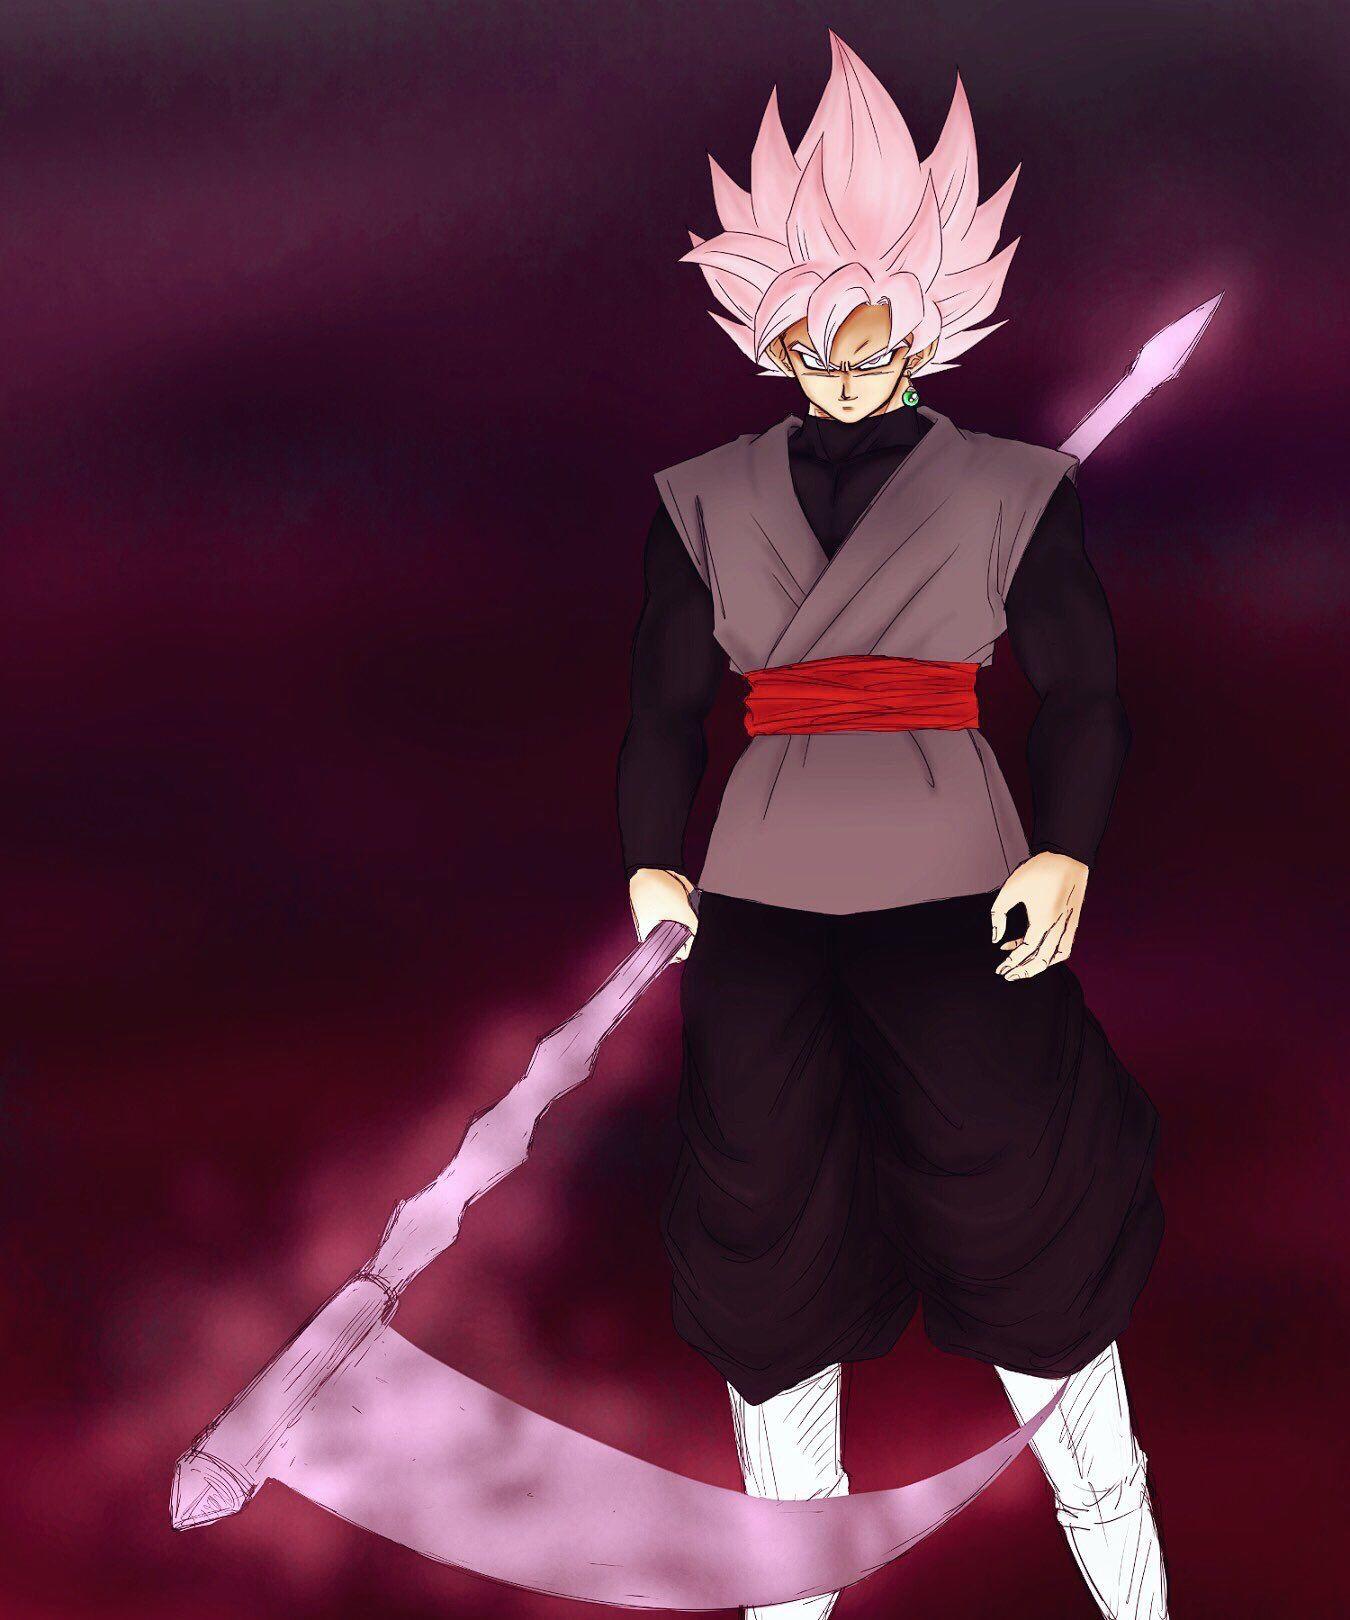 Blackgoku Scythe Dragon Ball Super Manga Goku Black Super Saiyan Rose